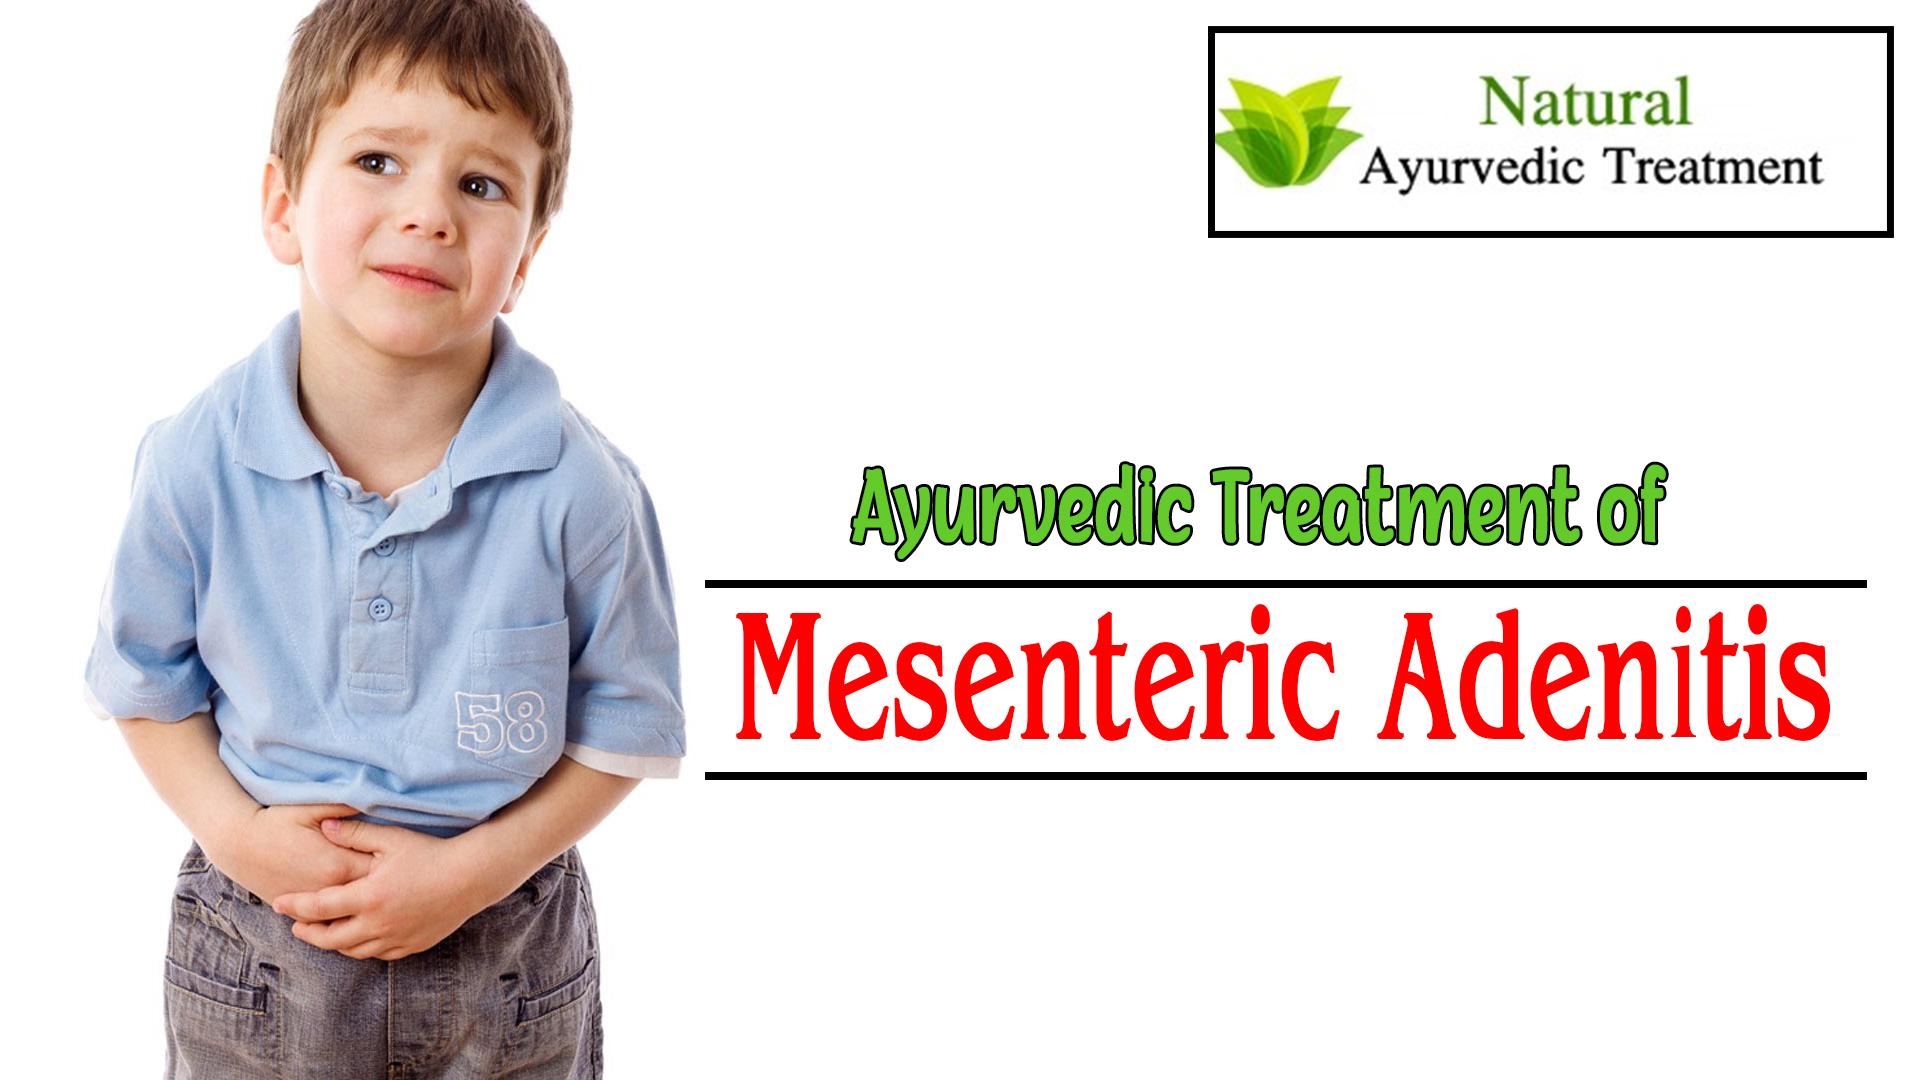 Ayurvedic Treatment for Mesenteric Adenitis - Symptoms & Herbal Remedies